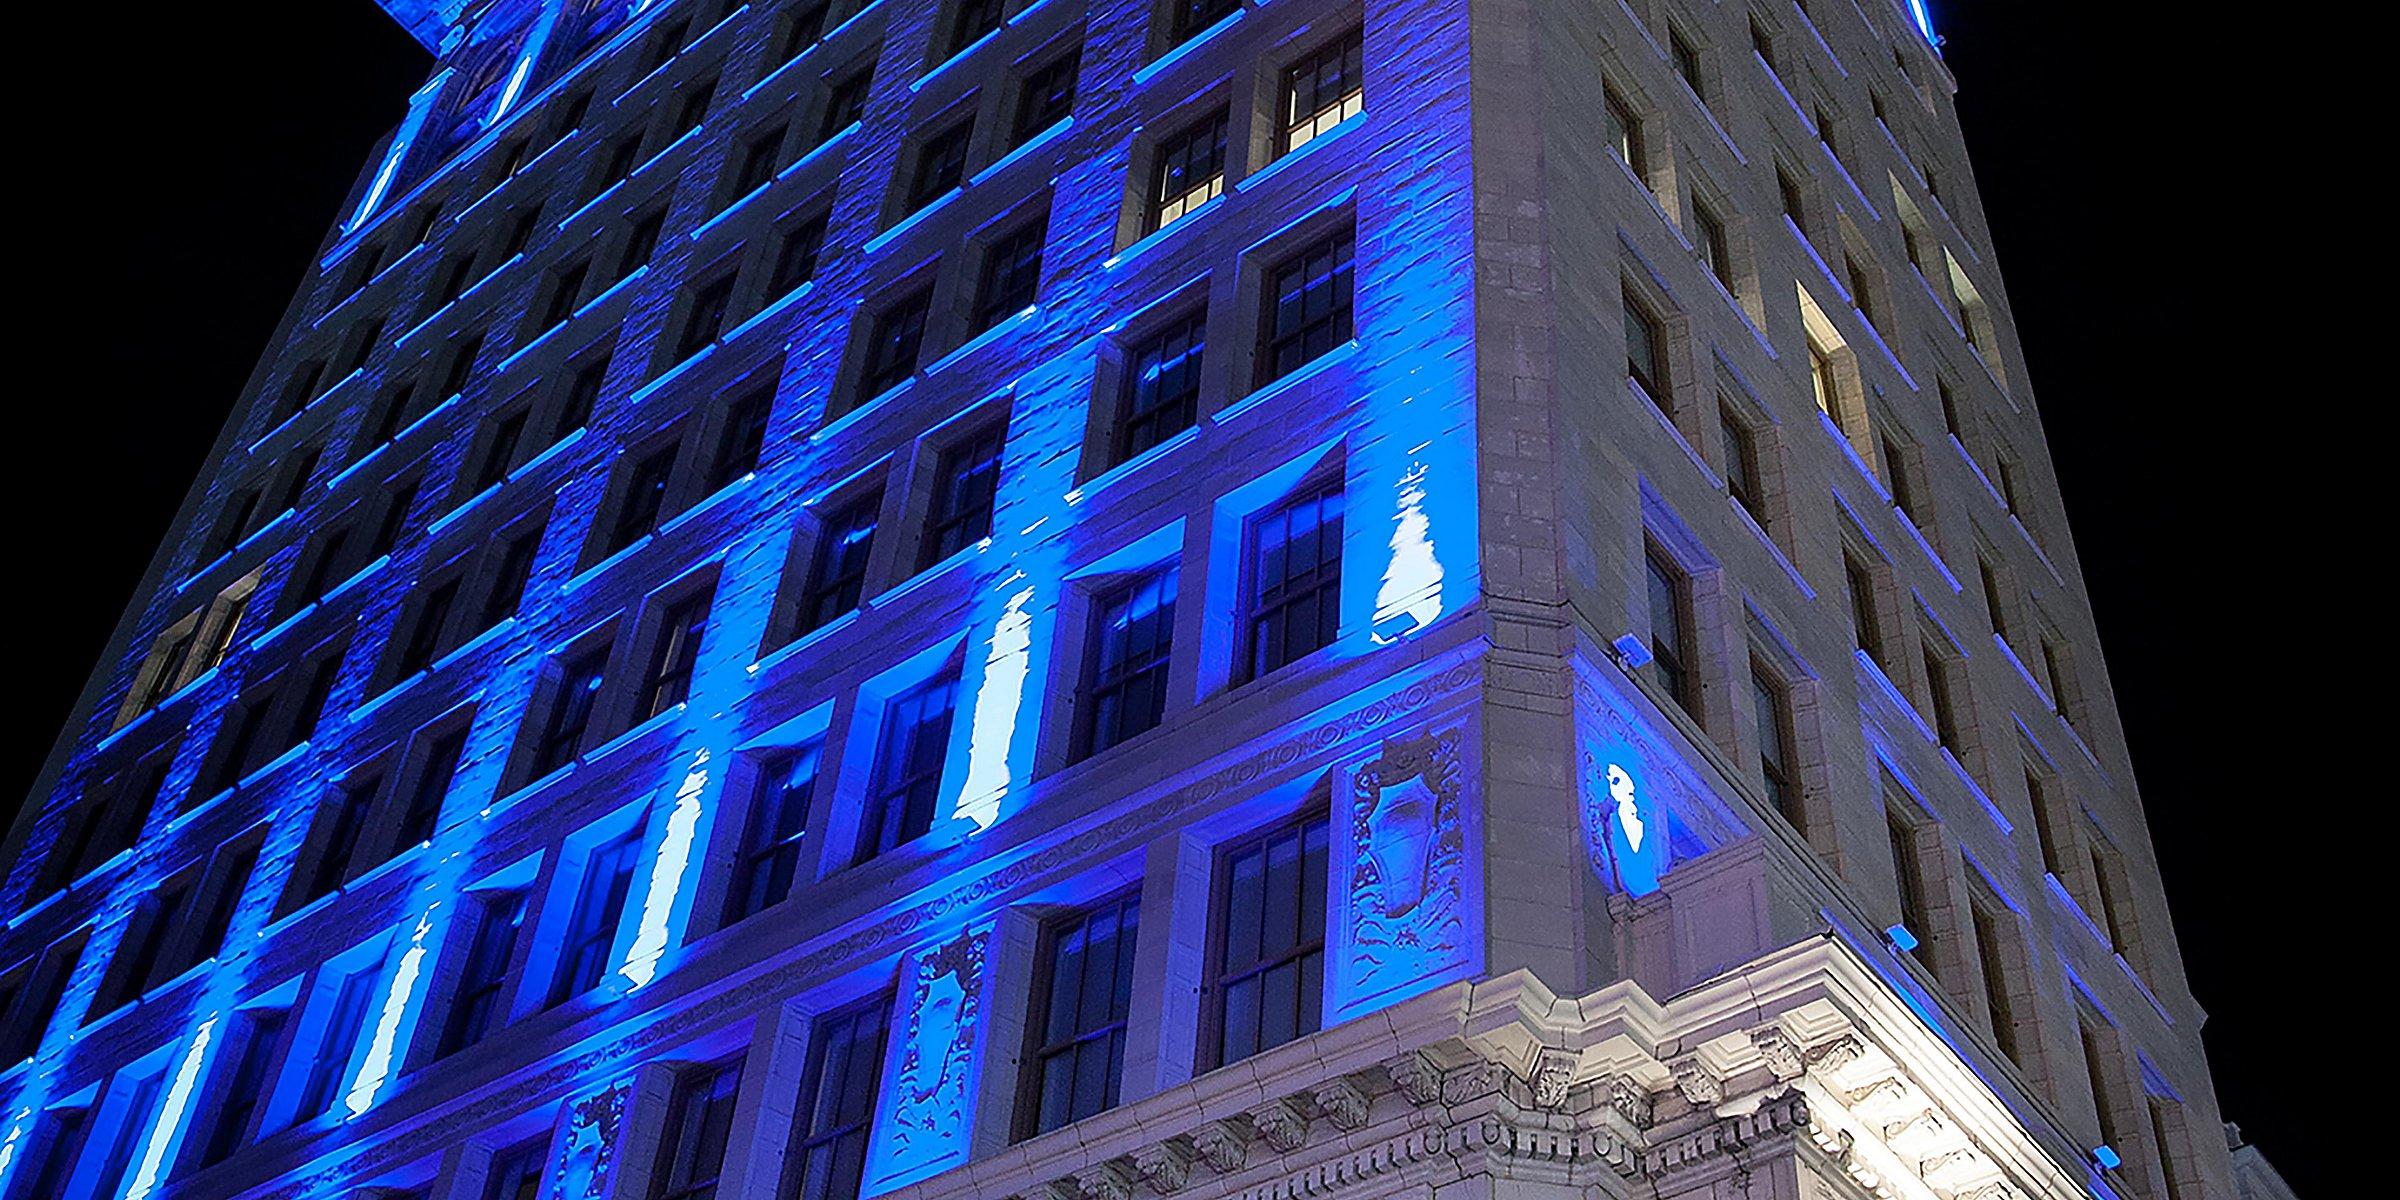 Hotels near Prudential Center | Hotel Indigo Newark | IHG